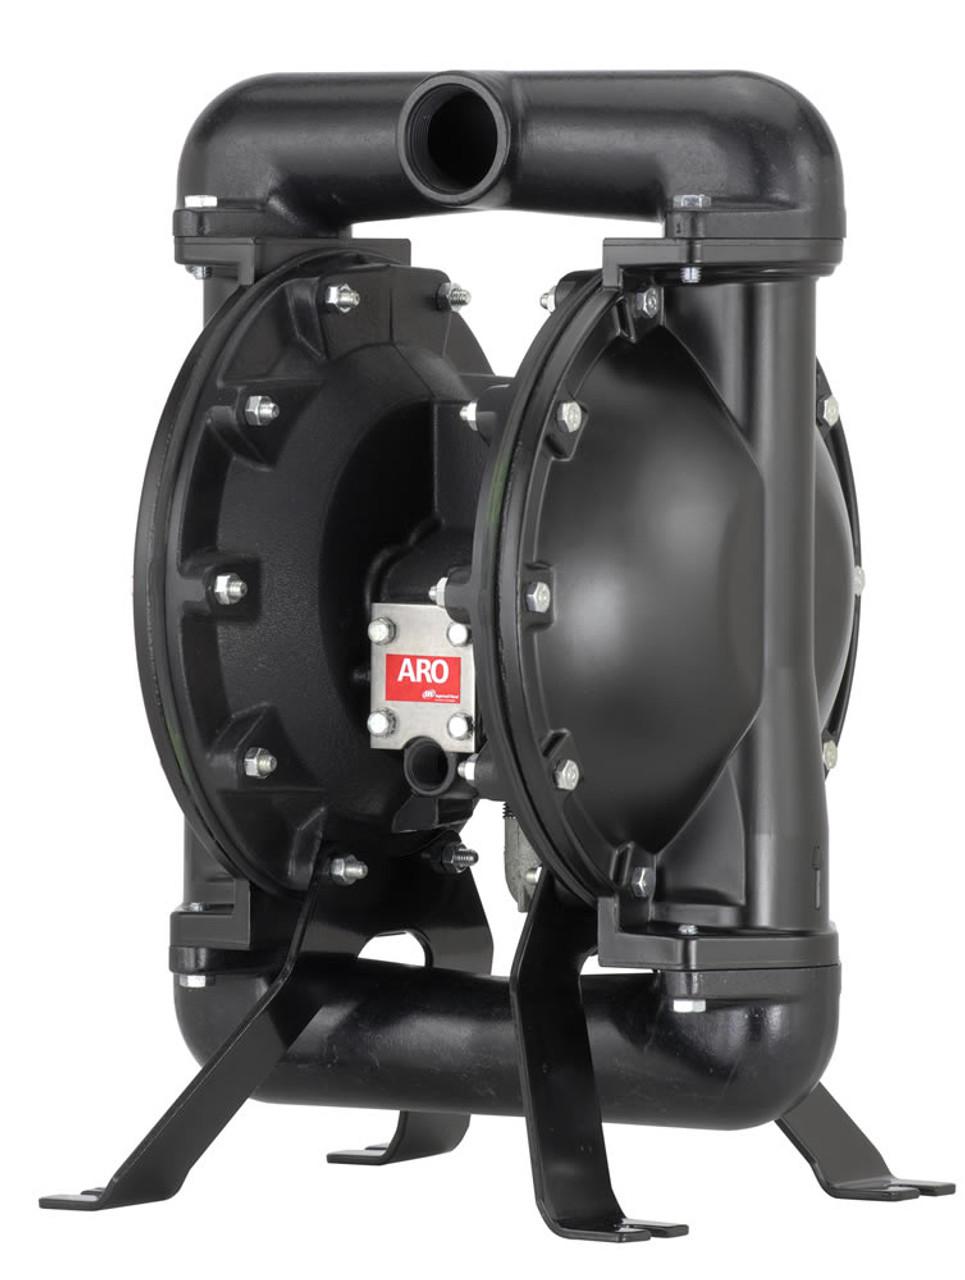 Aro 666150 3eb c 1 12 metallic pro series pump aro 666150 3eb c metallic diaphragm pump ccuart Choice Image